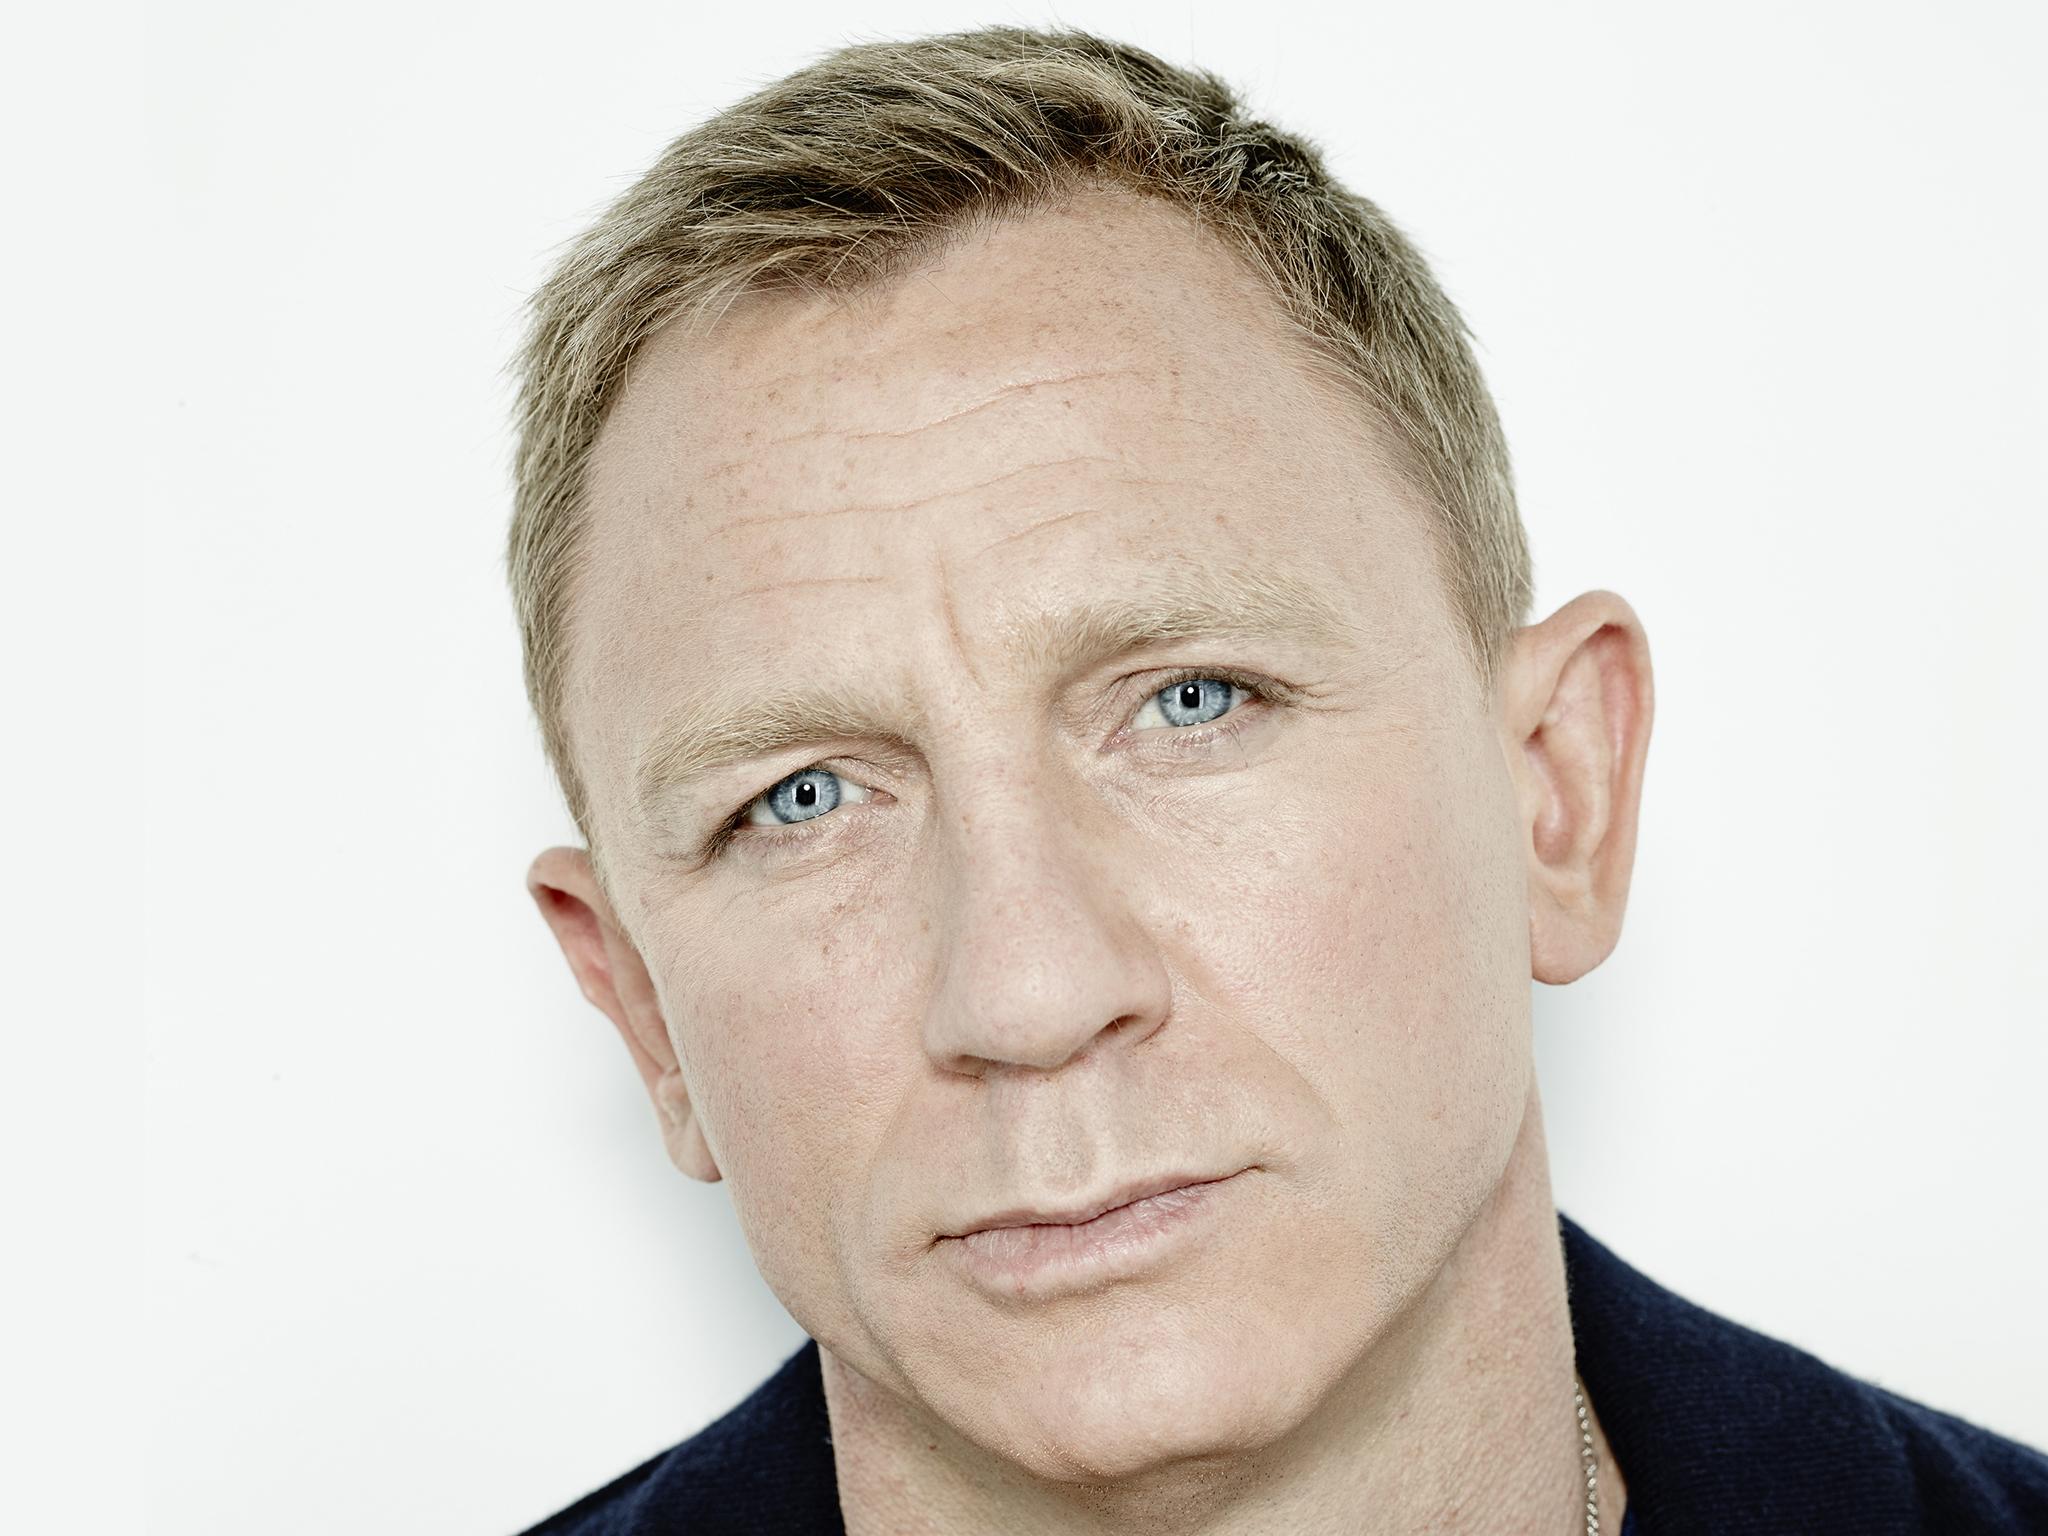 Daniel Craig talks 'Spectre' and his advice to future Bonds